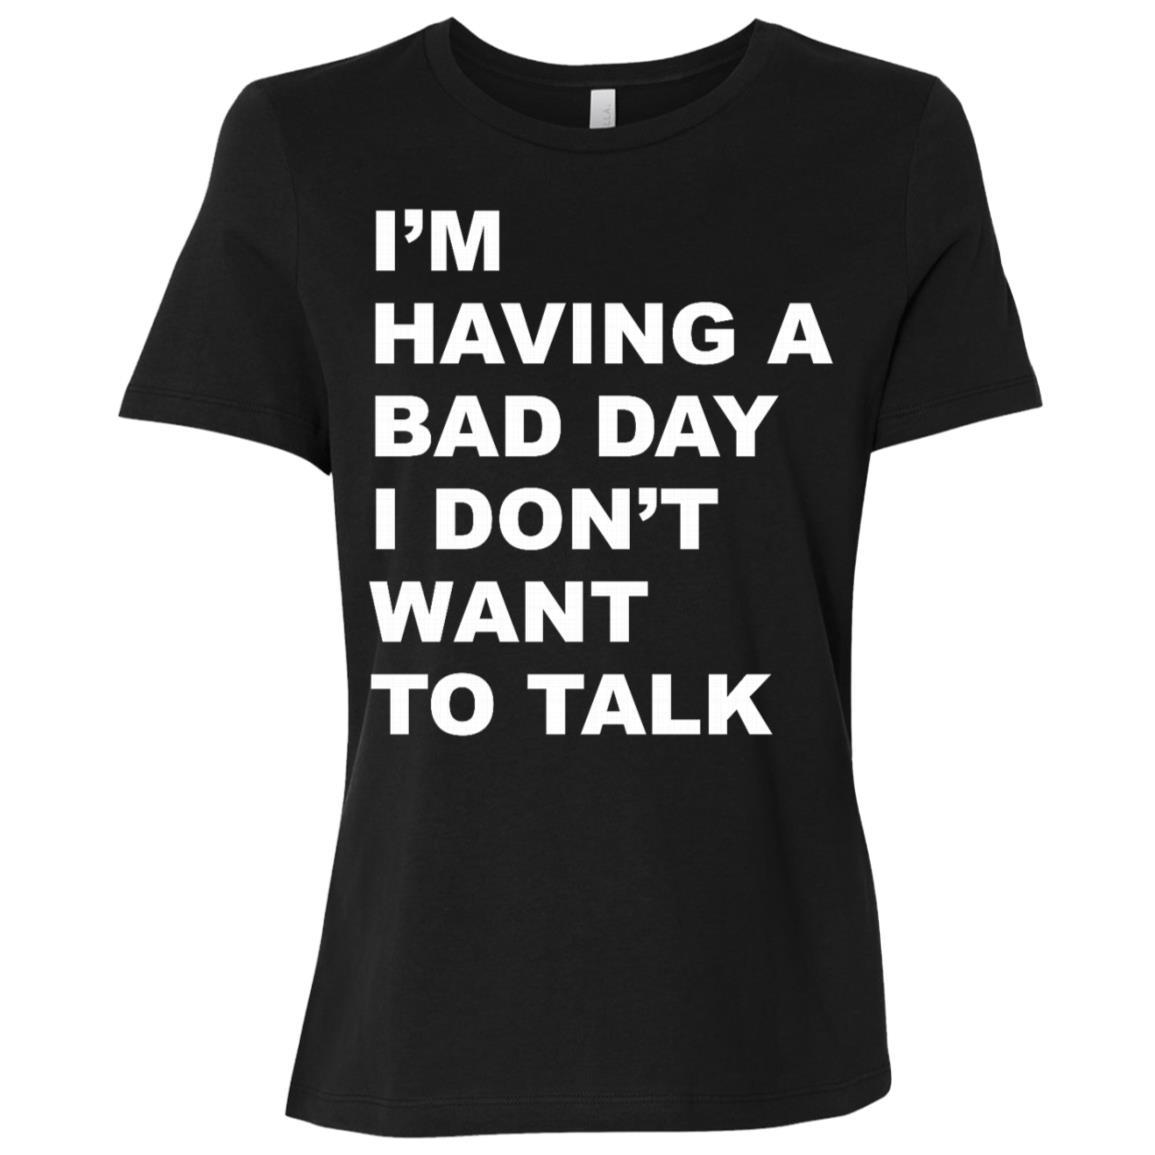 I'm having a bad day I don't want to talk Women Short Sleeve T-Shirt